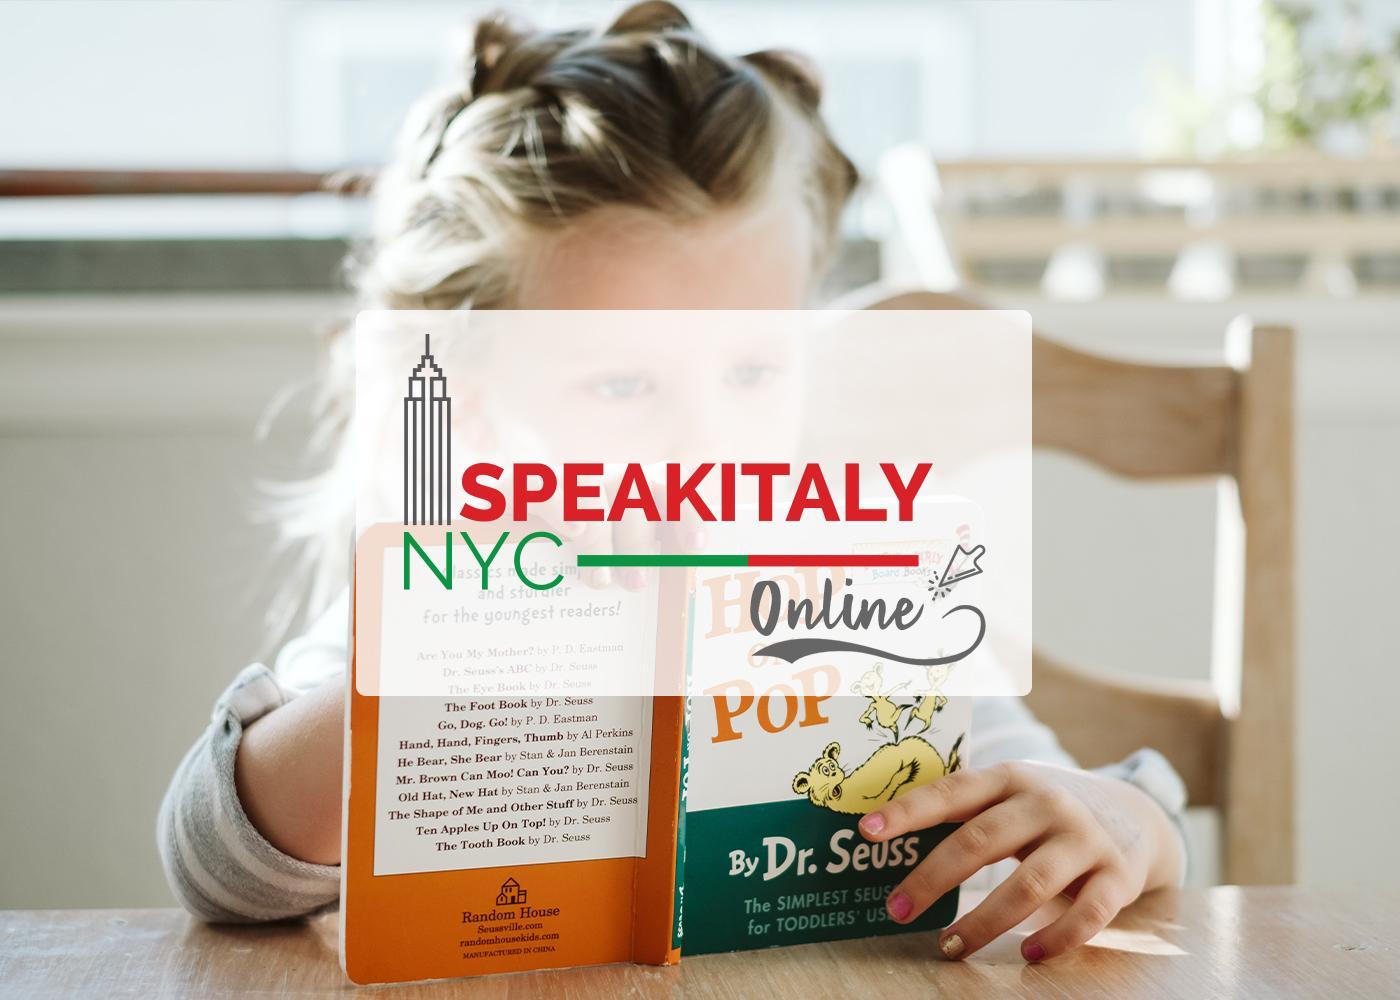 Italian Storytelling (Summer Edition) at Speakitaly NYC